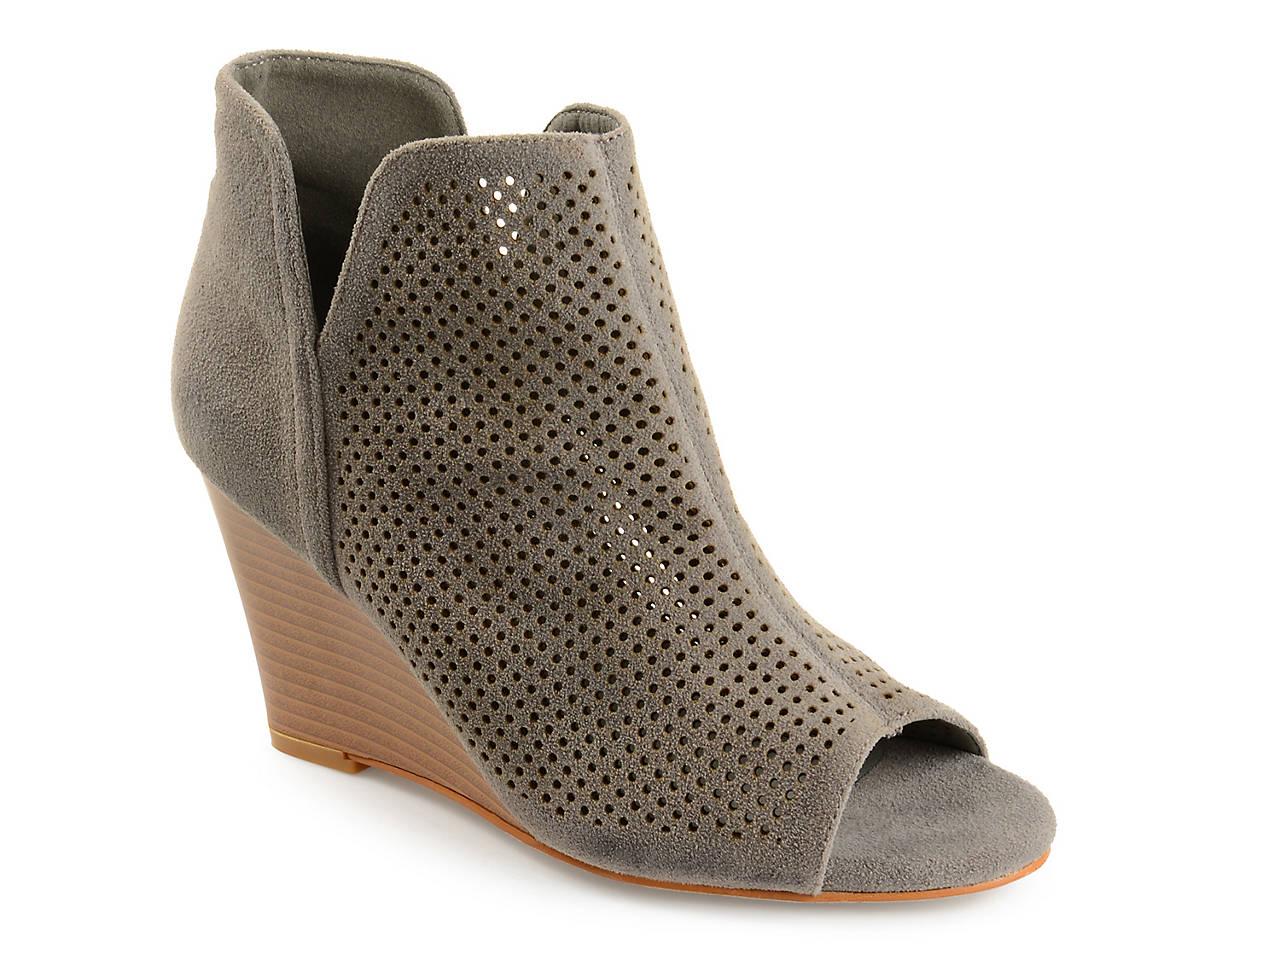 81f253d5548b Journee Collection Andies Wedge Bootie Women s Shoes